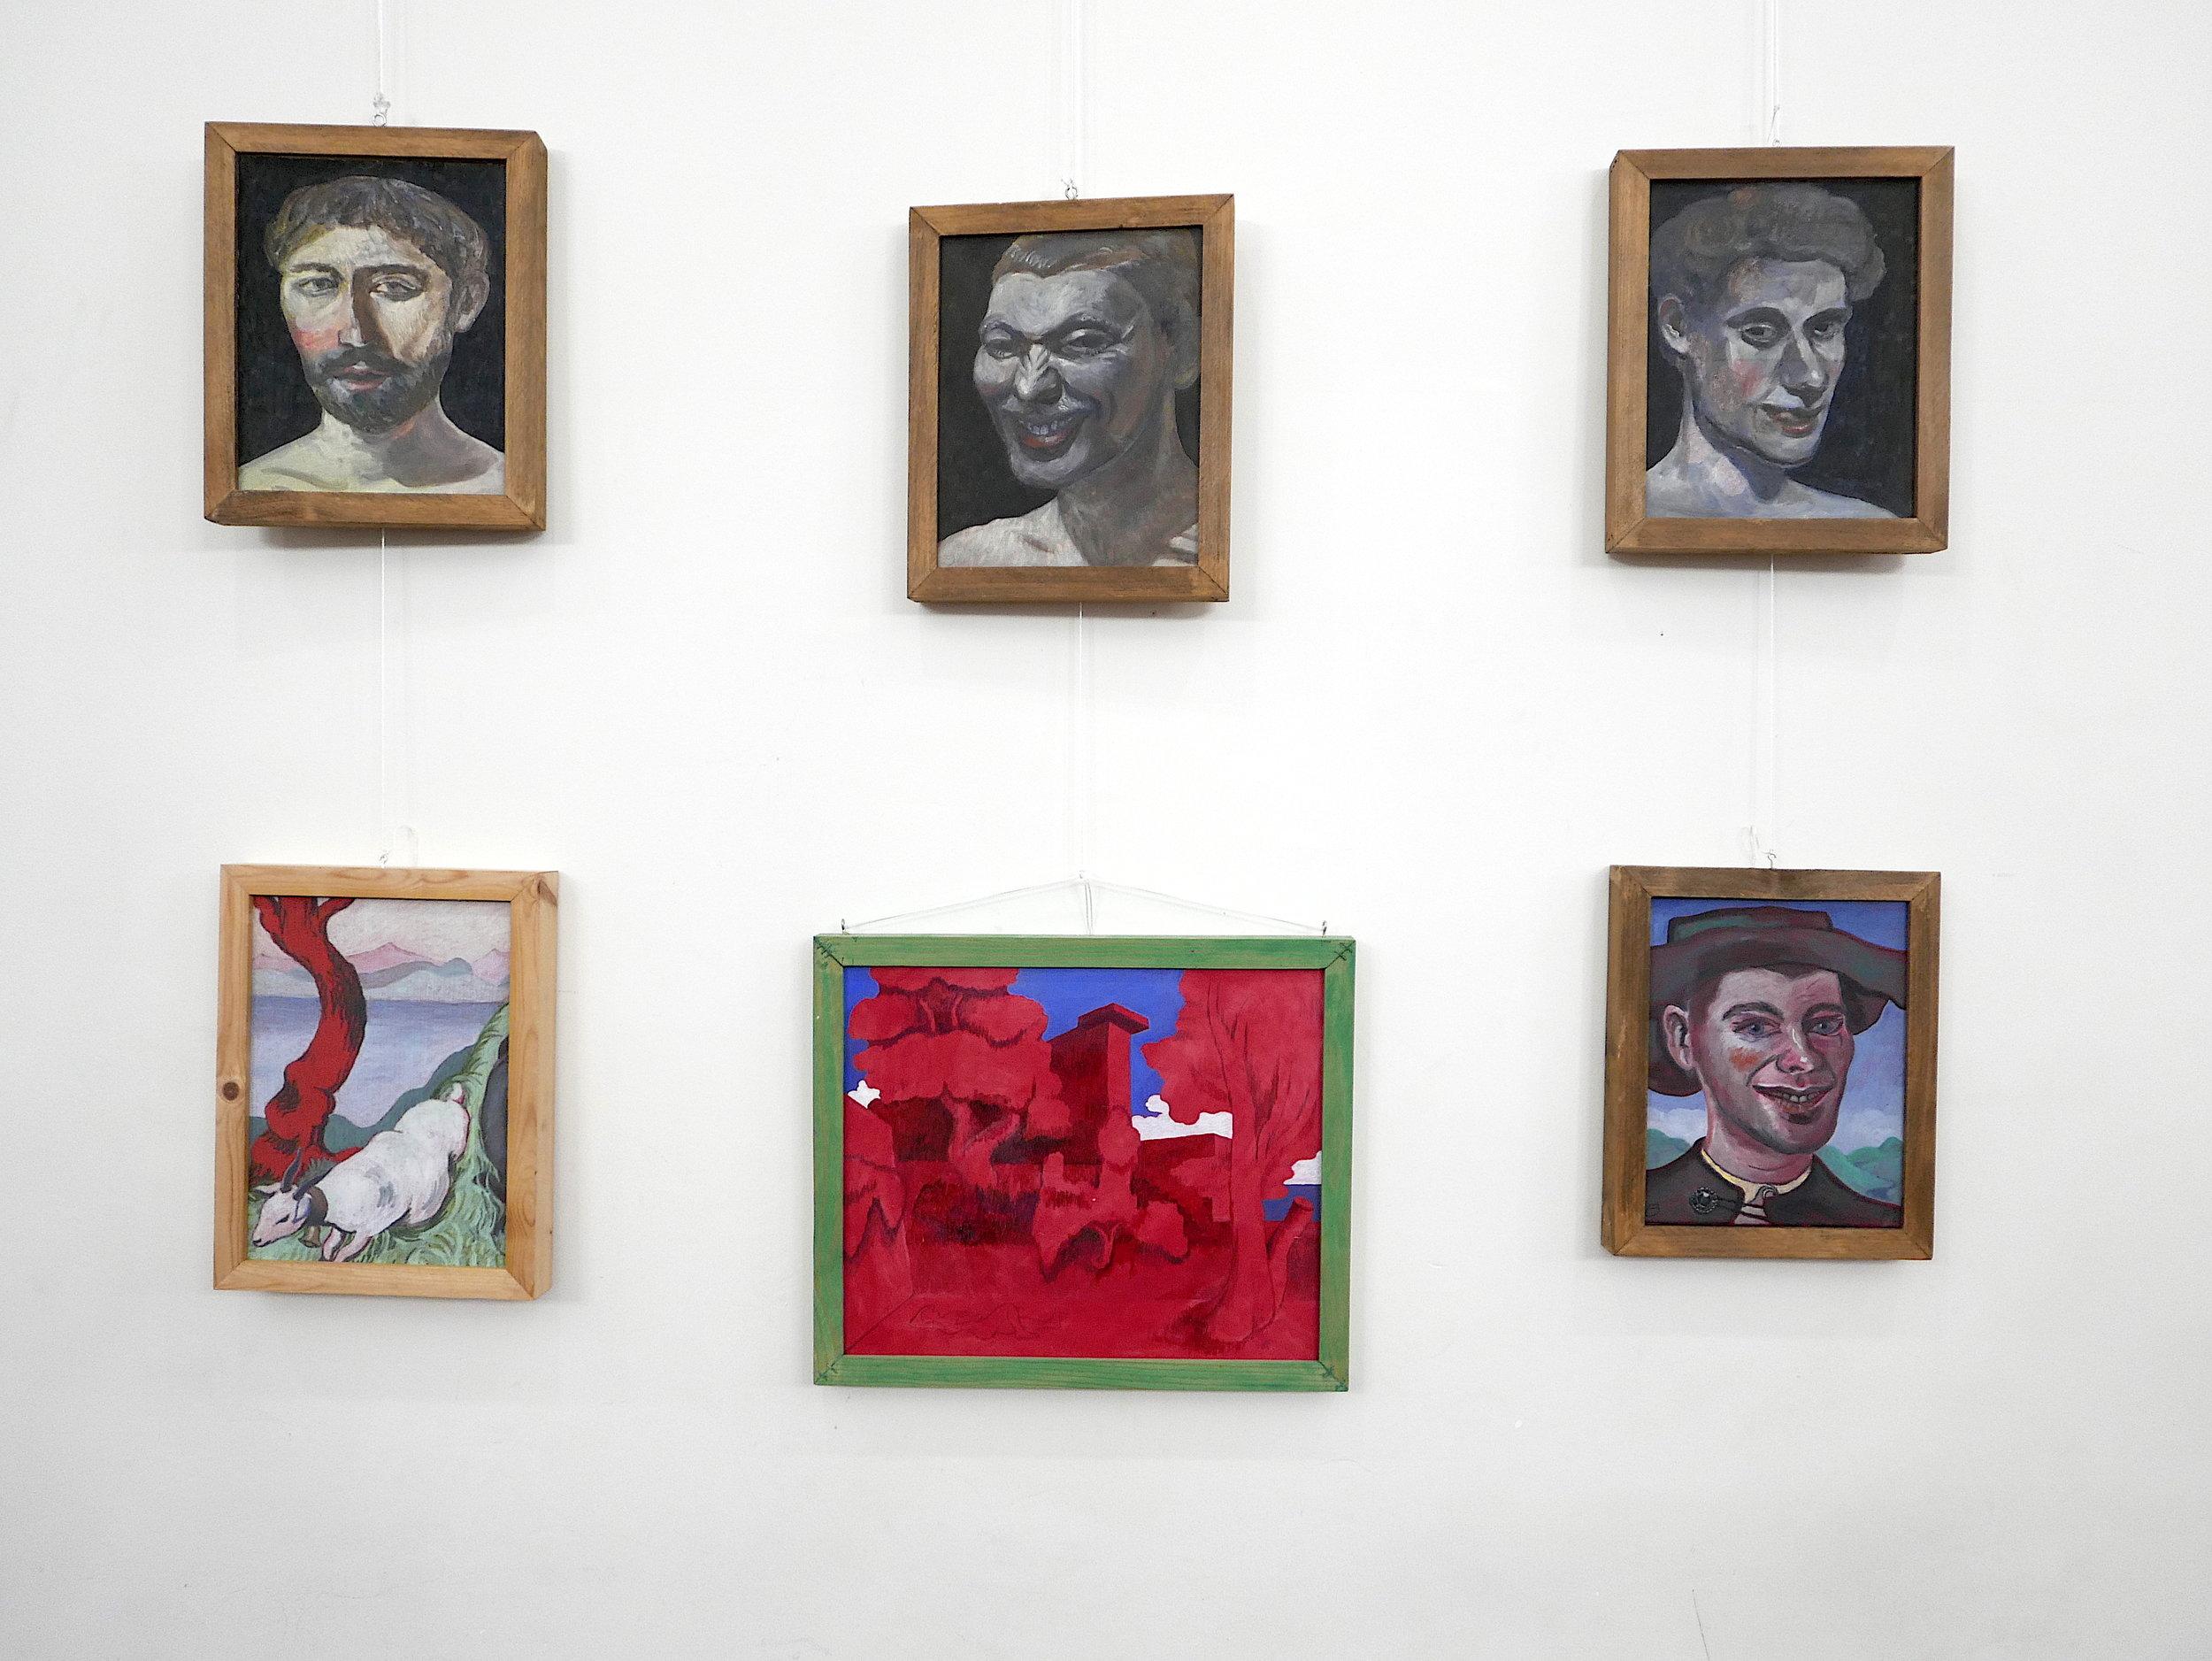 2019_READER-Ben_Lyonesse-exhibit-Porto_1070110.JPG